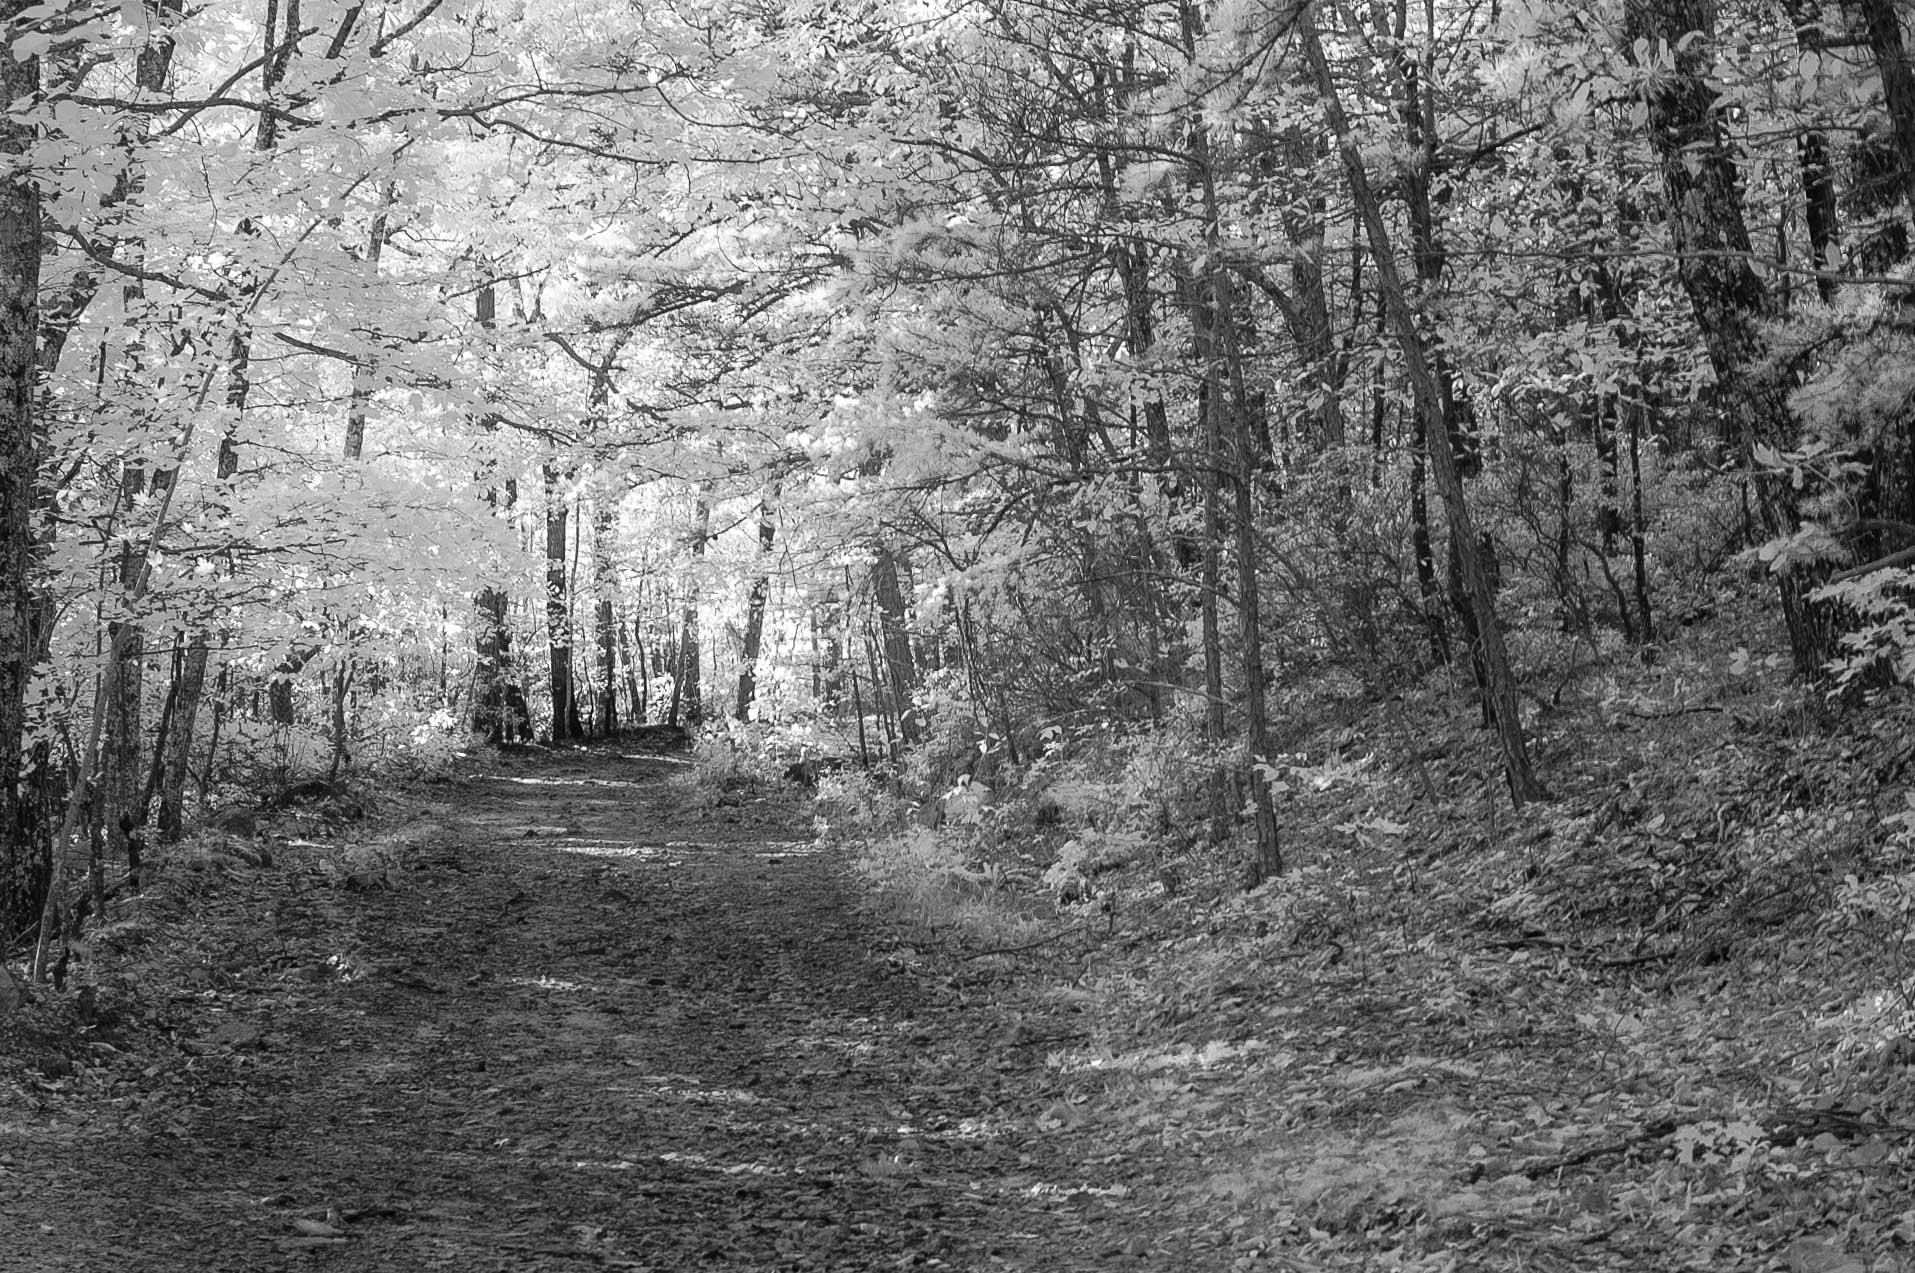 Binhammerphotographs infrared photography trails